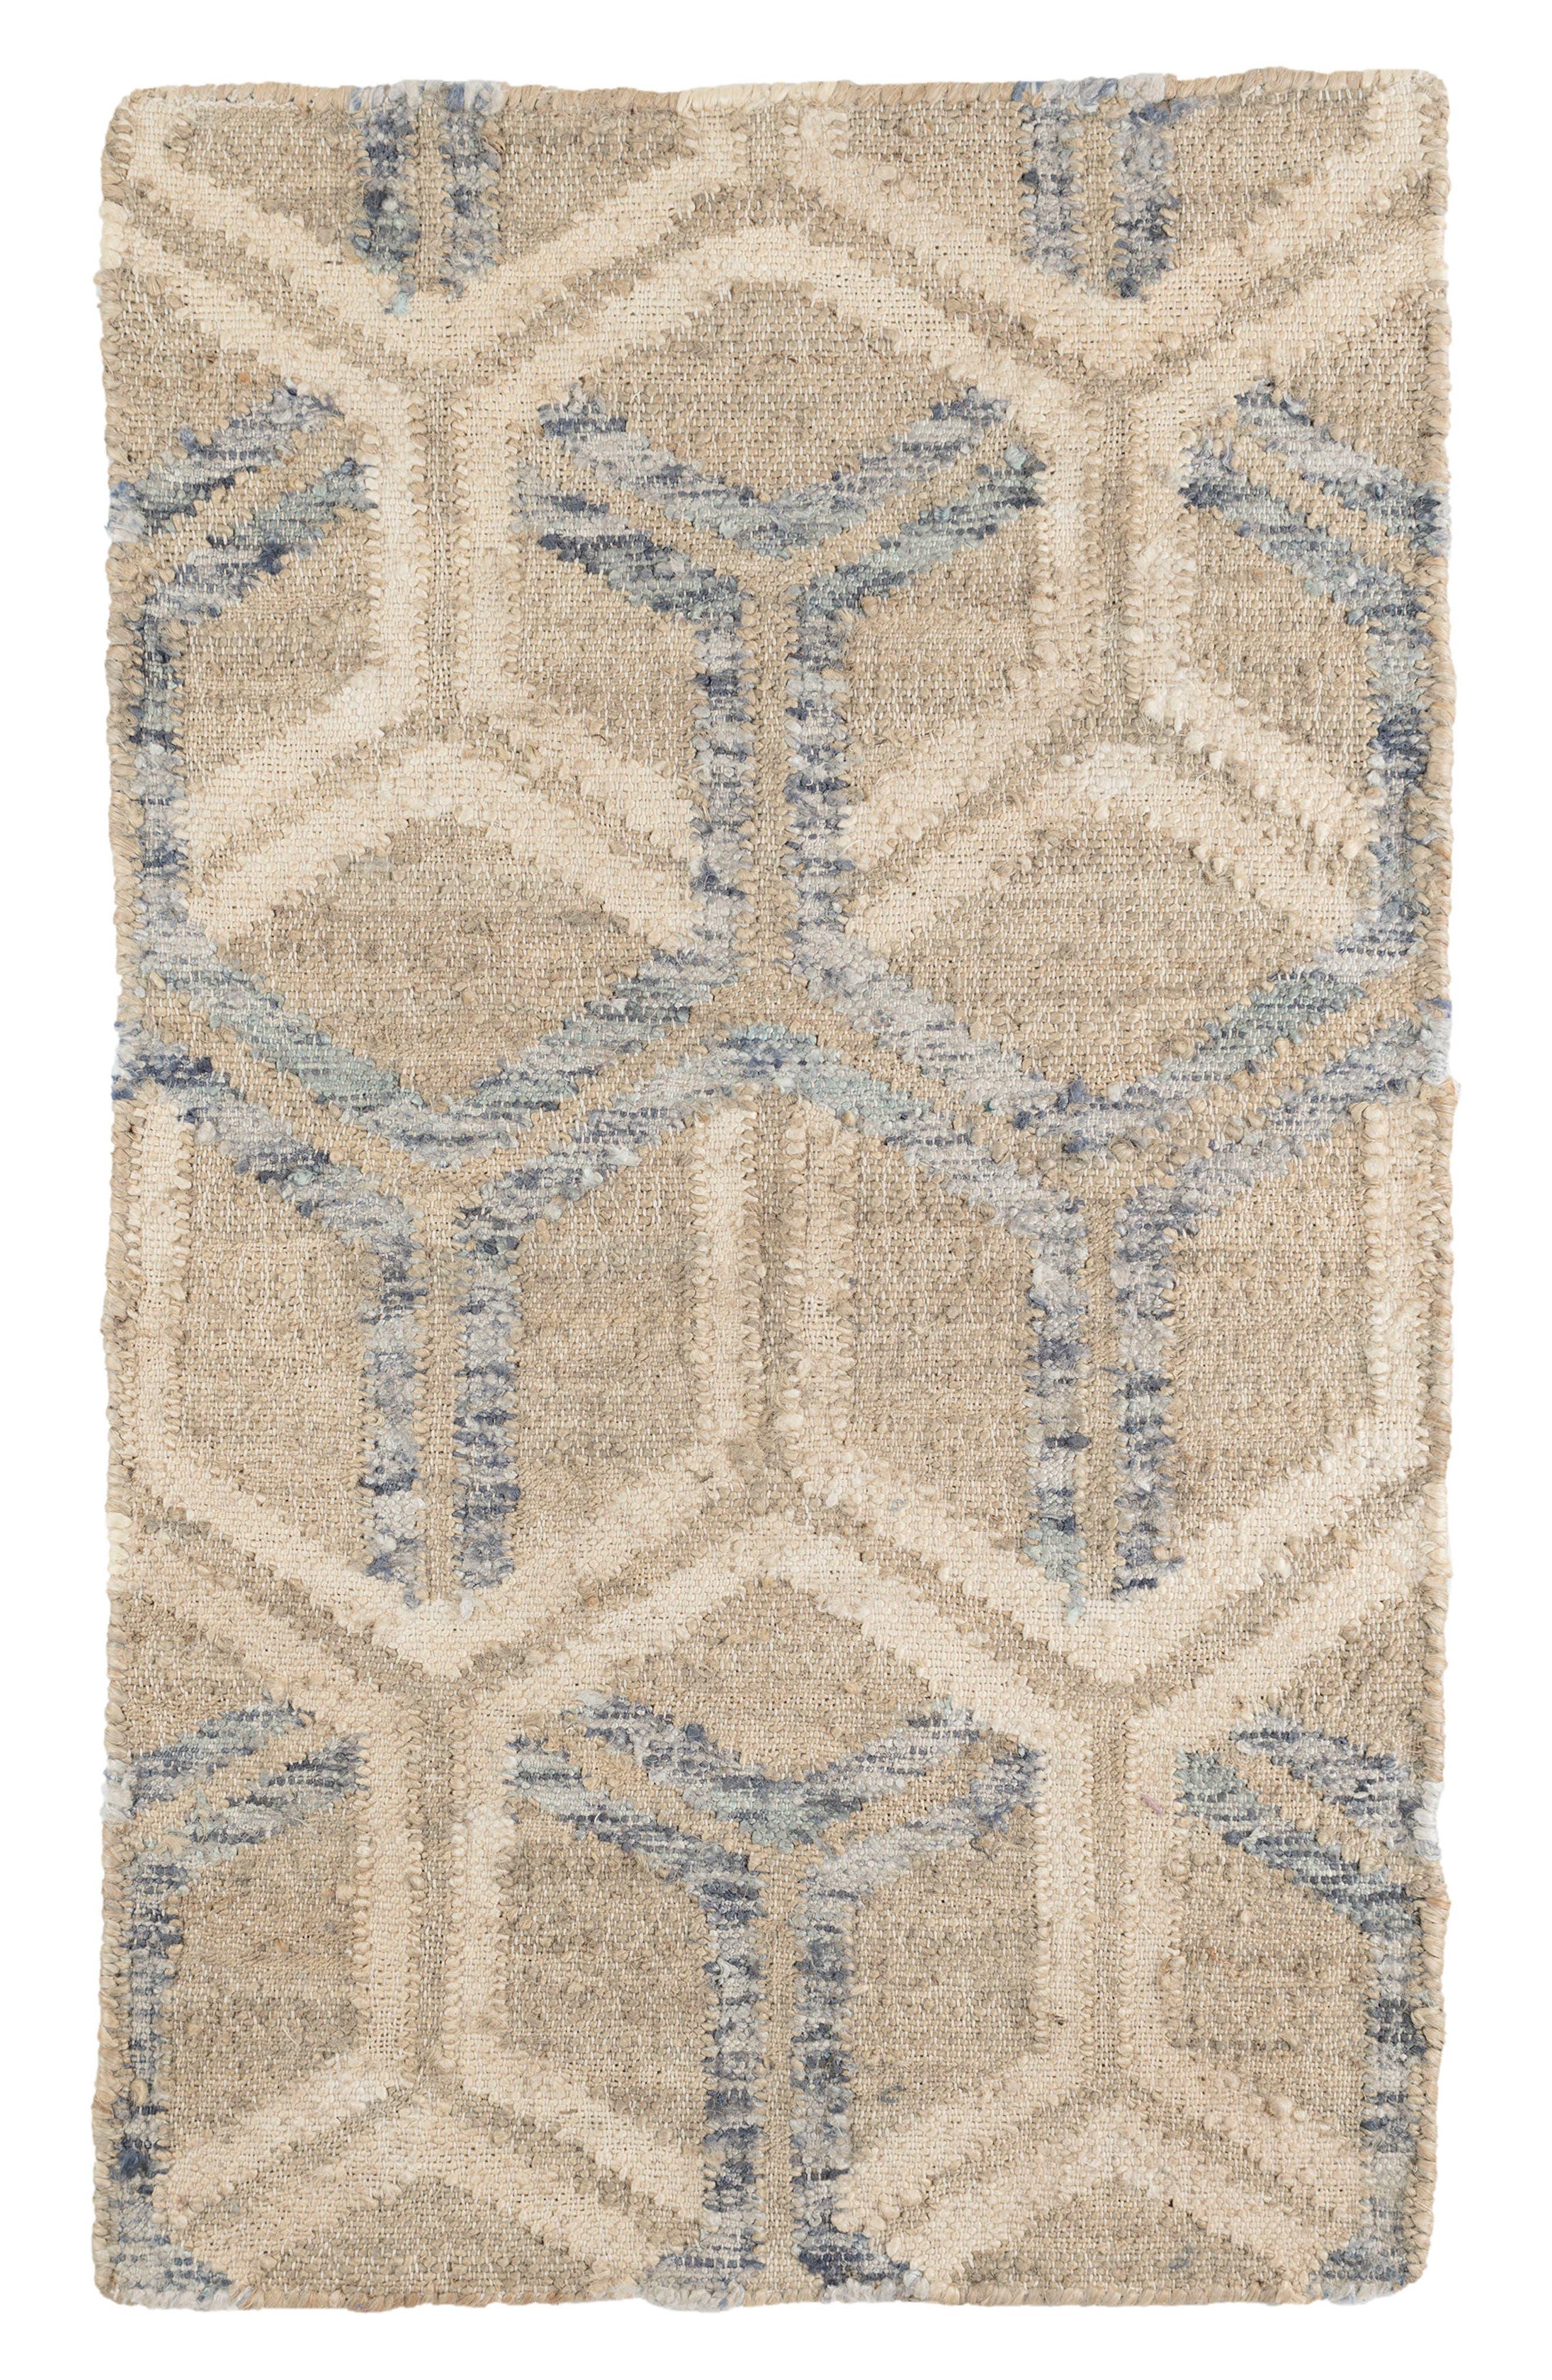 Alternate Image 1 Selected - Dash & Albert Tala Woven Jute & Cotton Rug